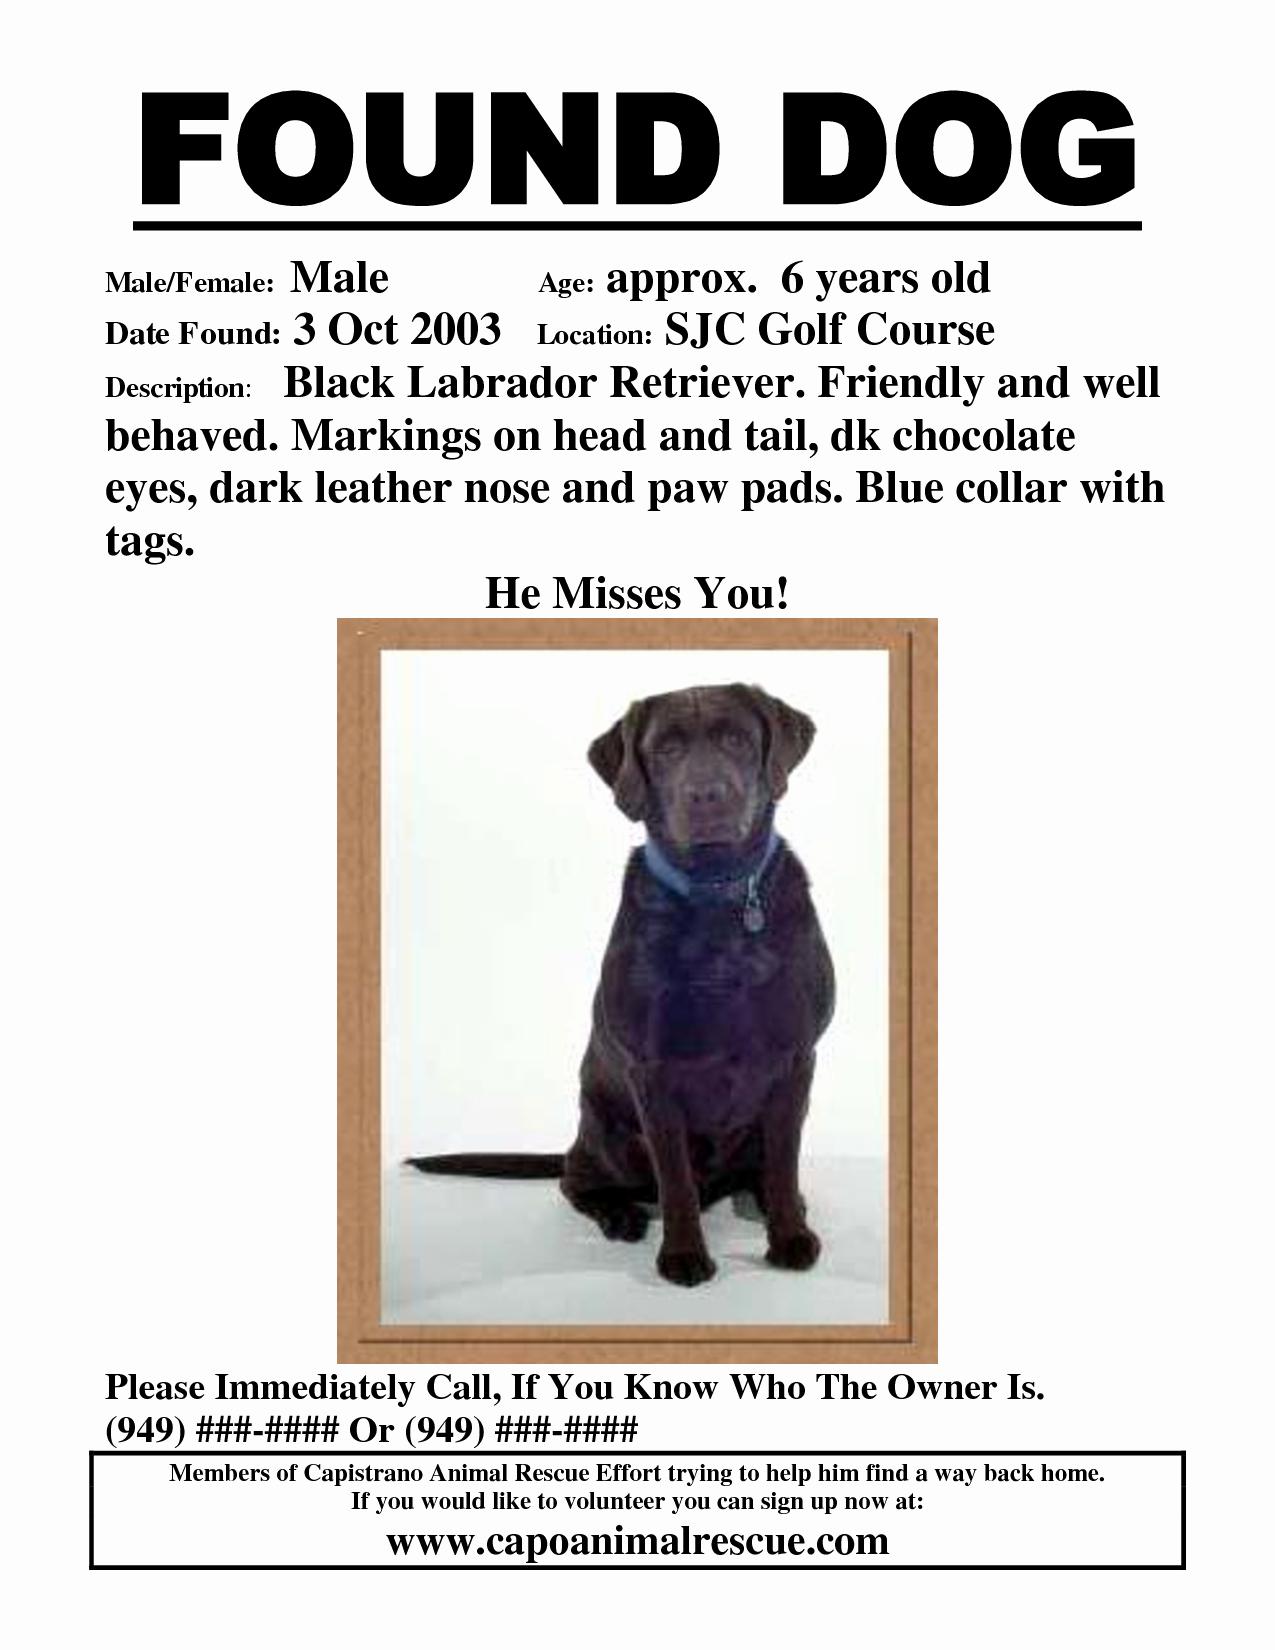 Missing Dog Flyer Template Best Of Found Dog Poster Template Portablegasgrillweber